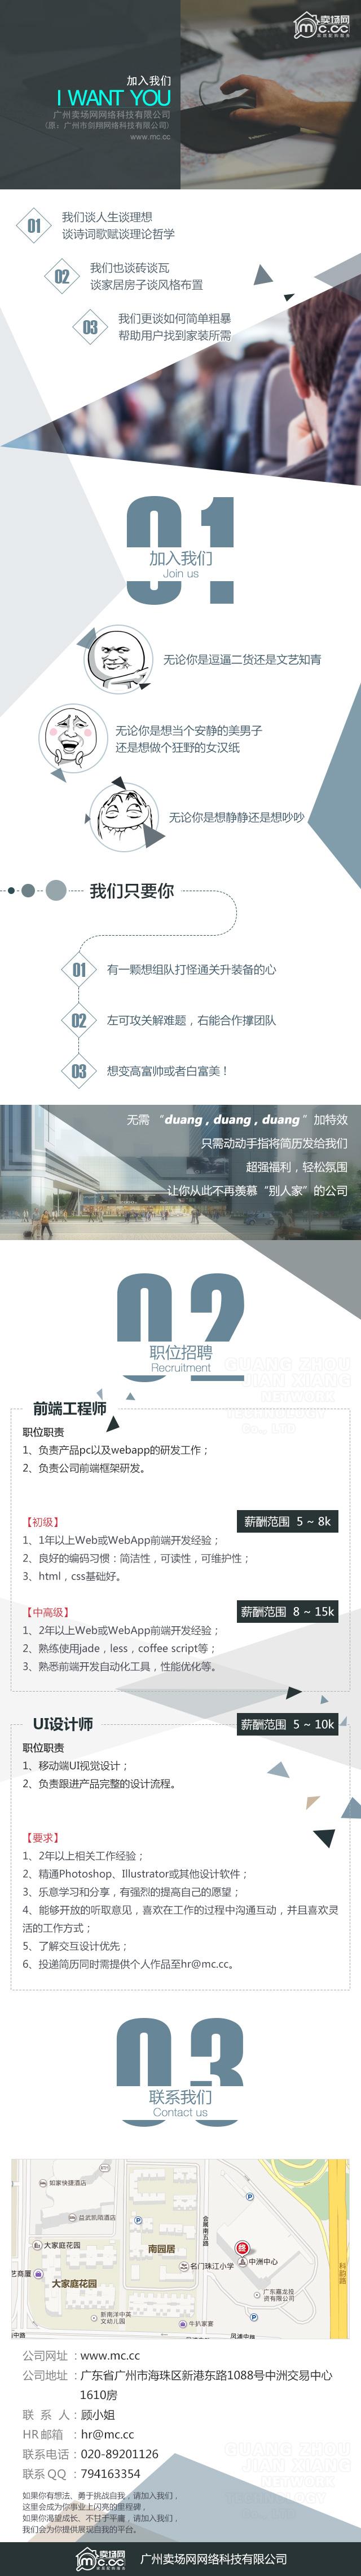 2015-maichang-jobs